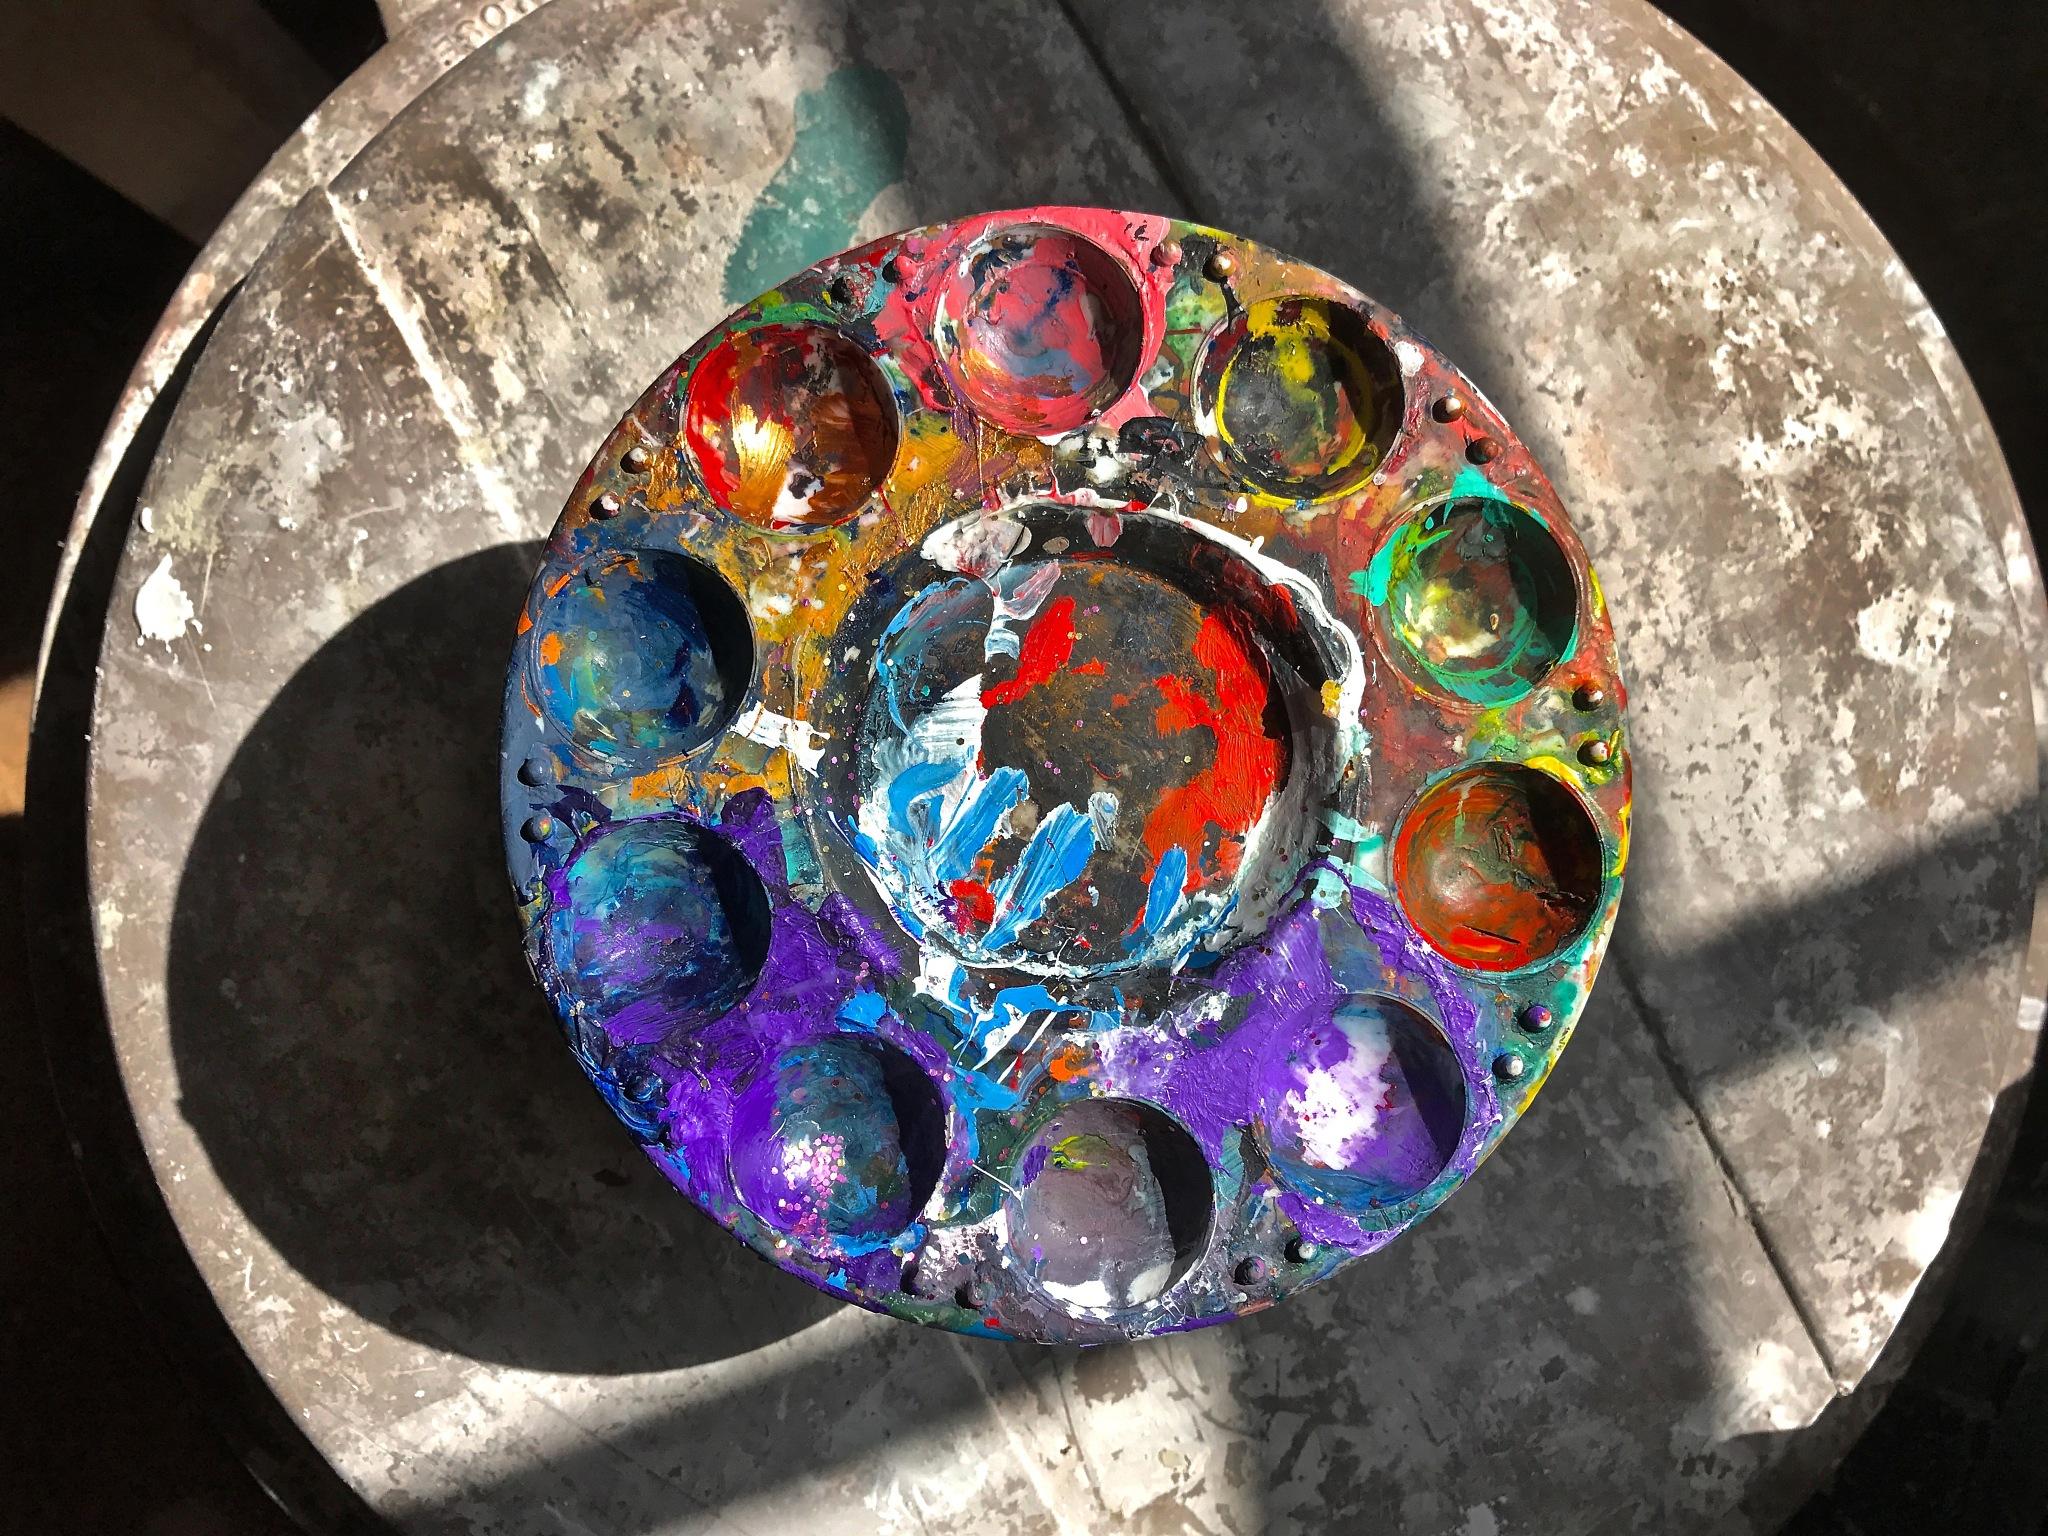 Making Art by warriston